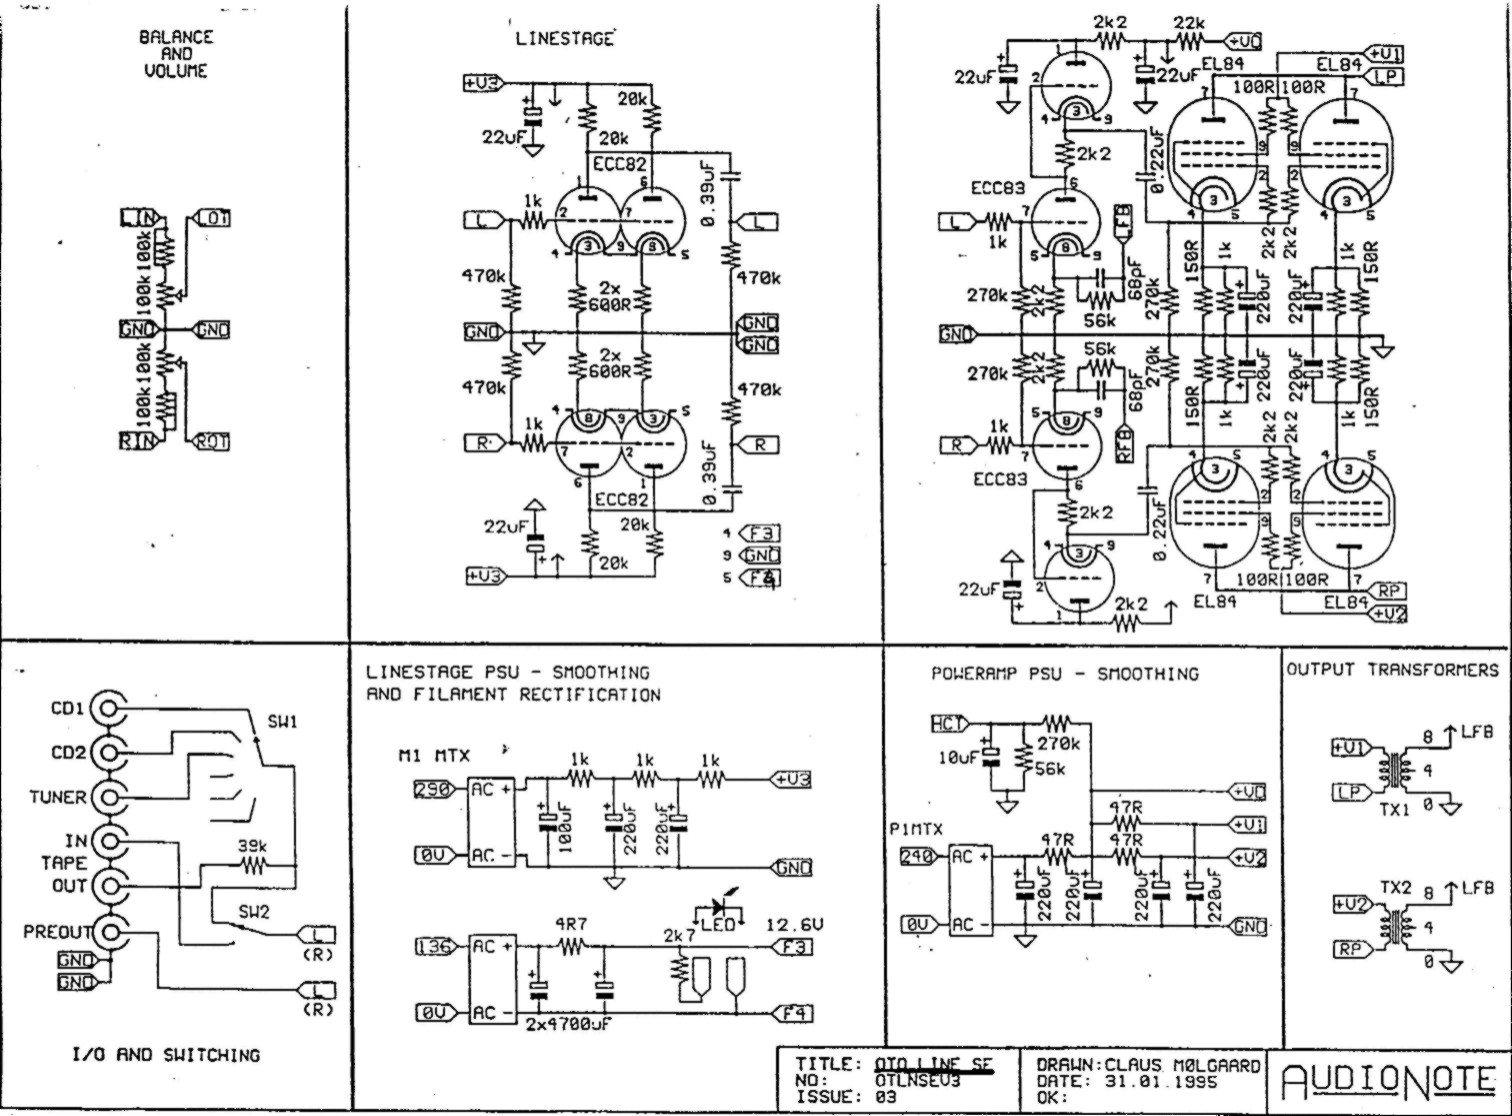 407D2EE2-0014-4C2F-A2B8-DB7B4D5897CF.jpeg